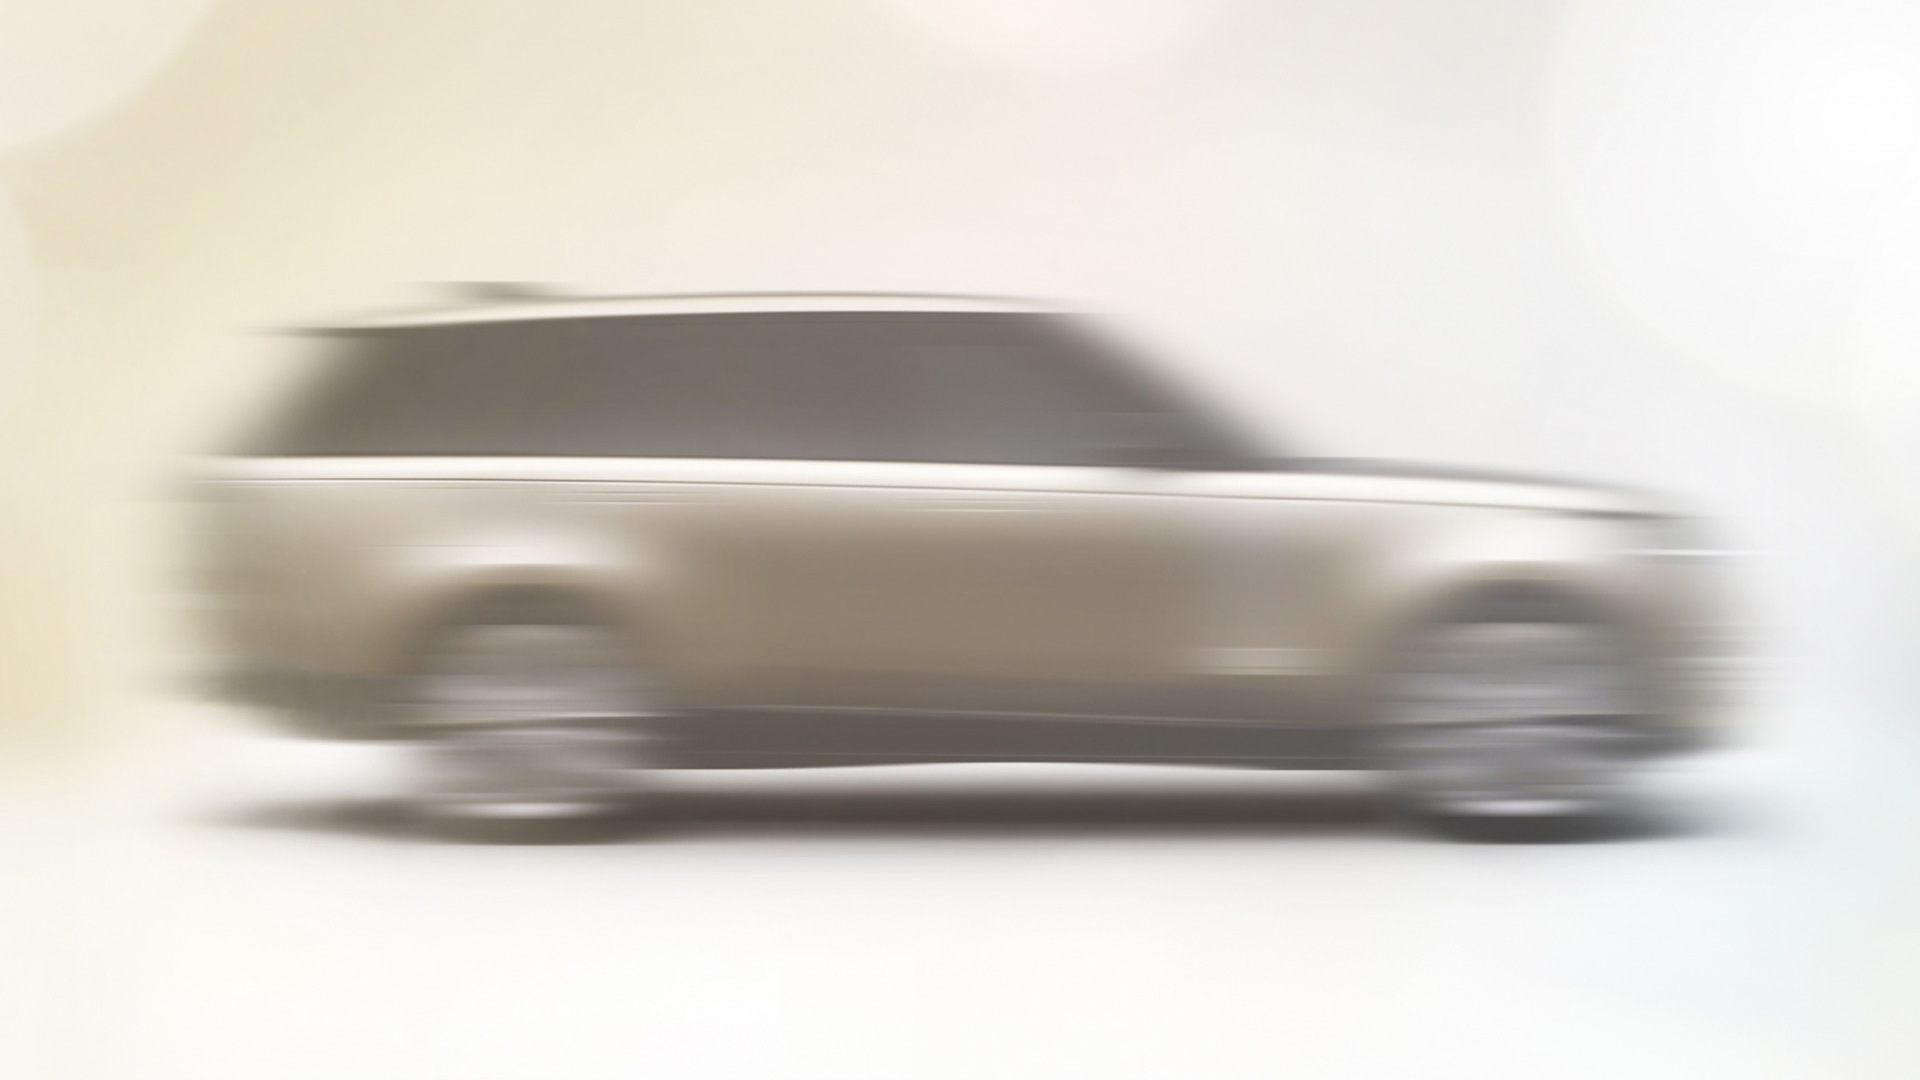 Teaser for 2023 Land Rover Range Rover debuting on October 26, 2021